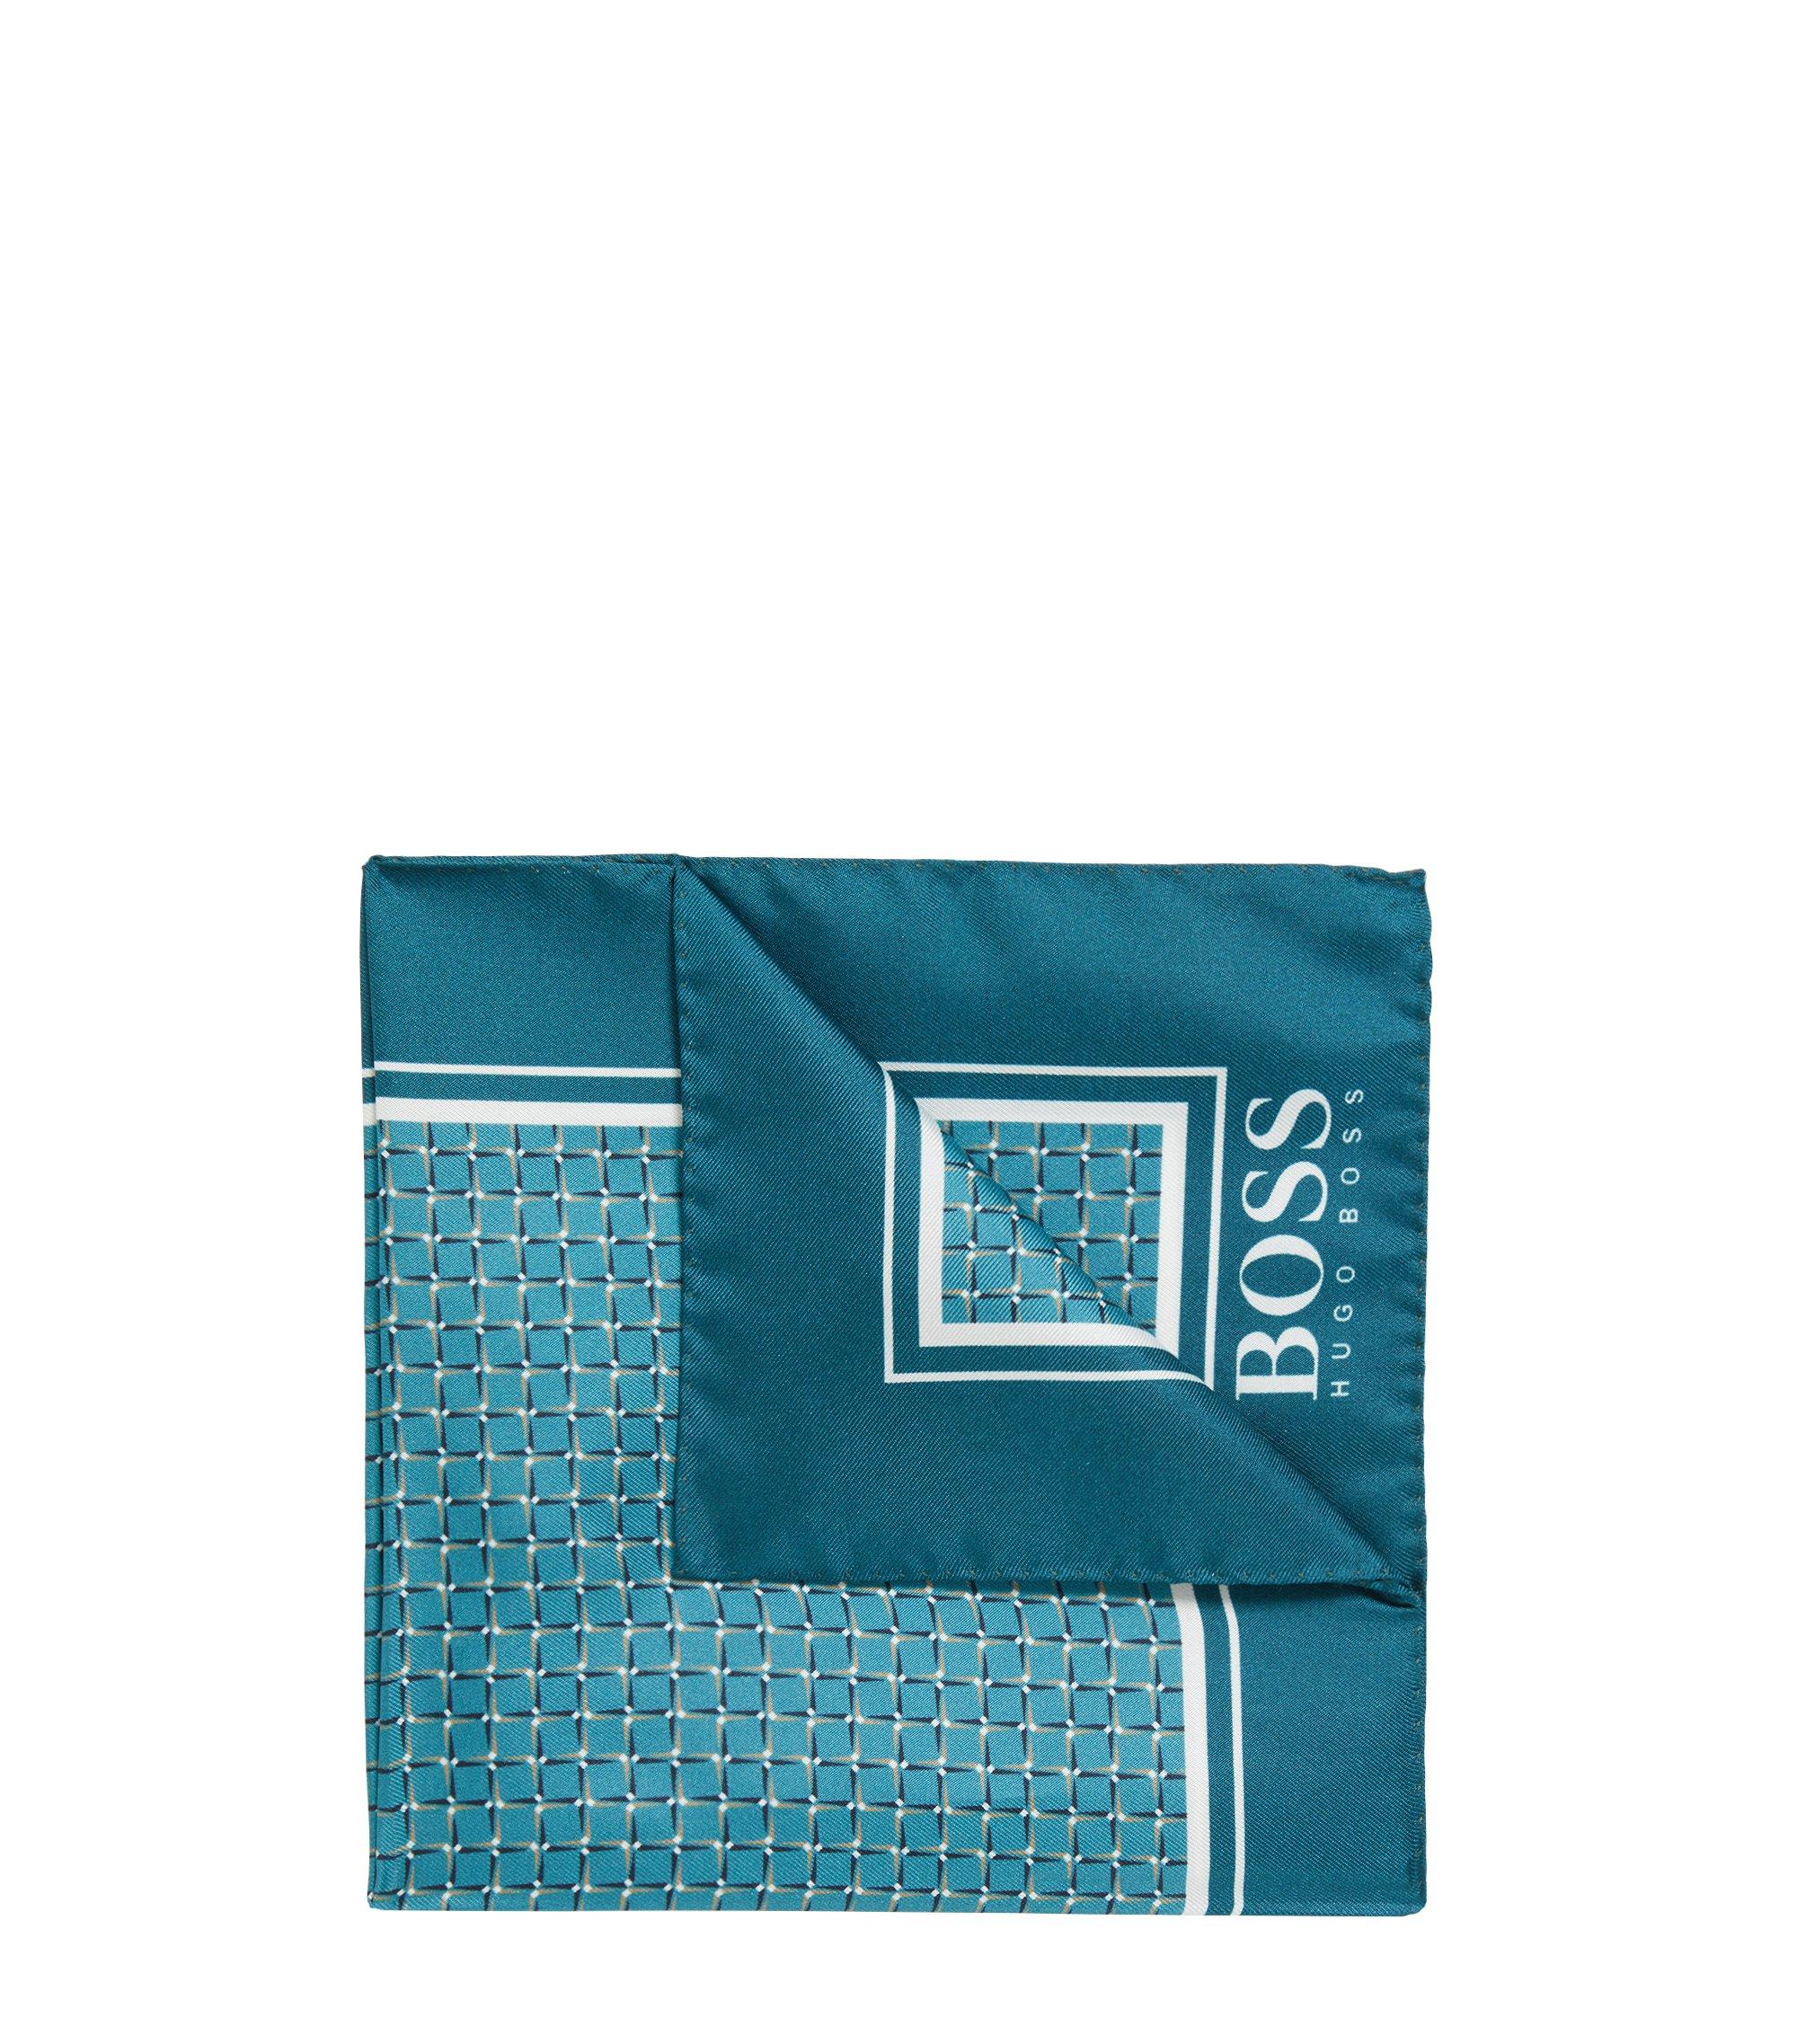 Pañuelo de bolsillo de seda con motivo de cuadros estampados digitalmente, Turquesa